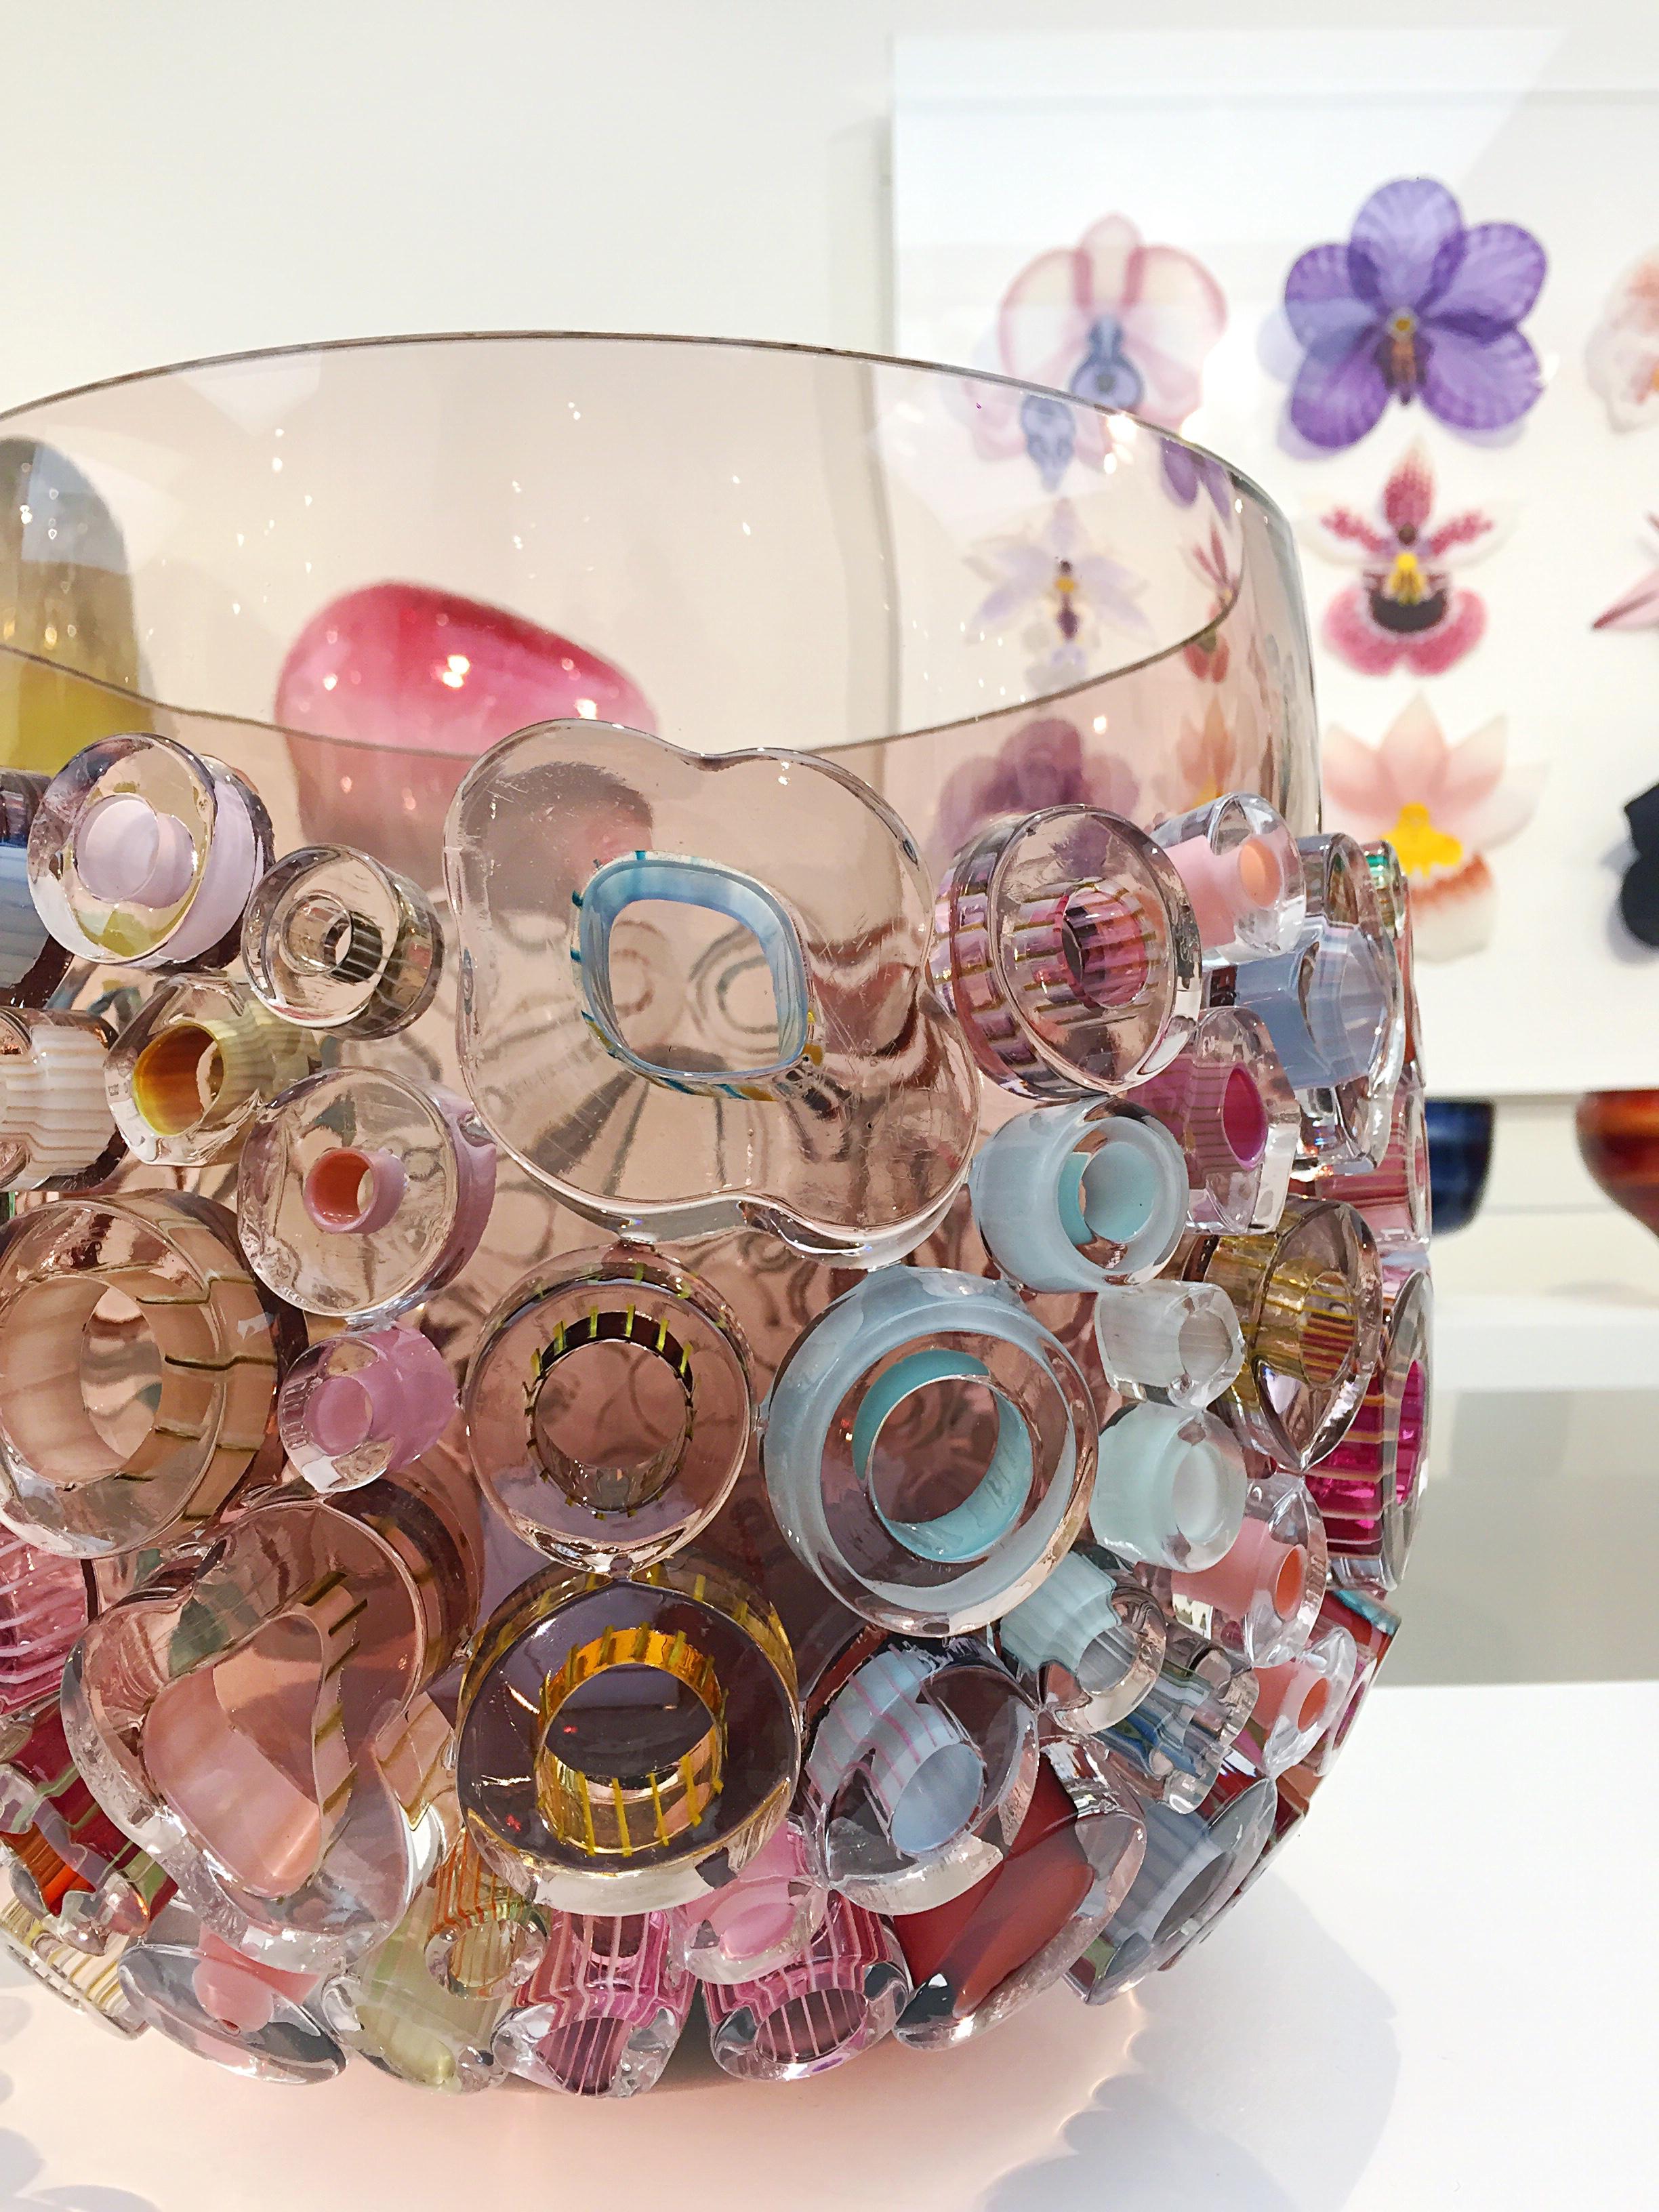 Sabine Lintzen at Vessel Gallery